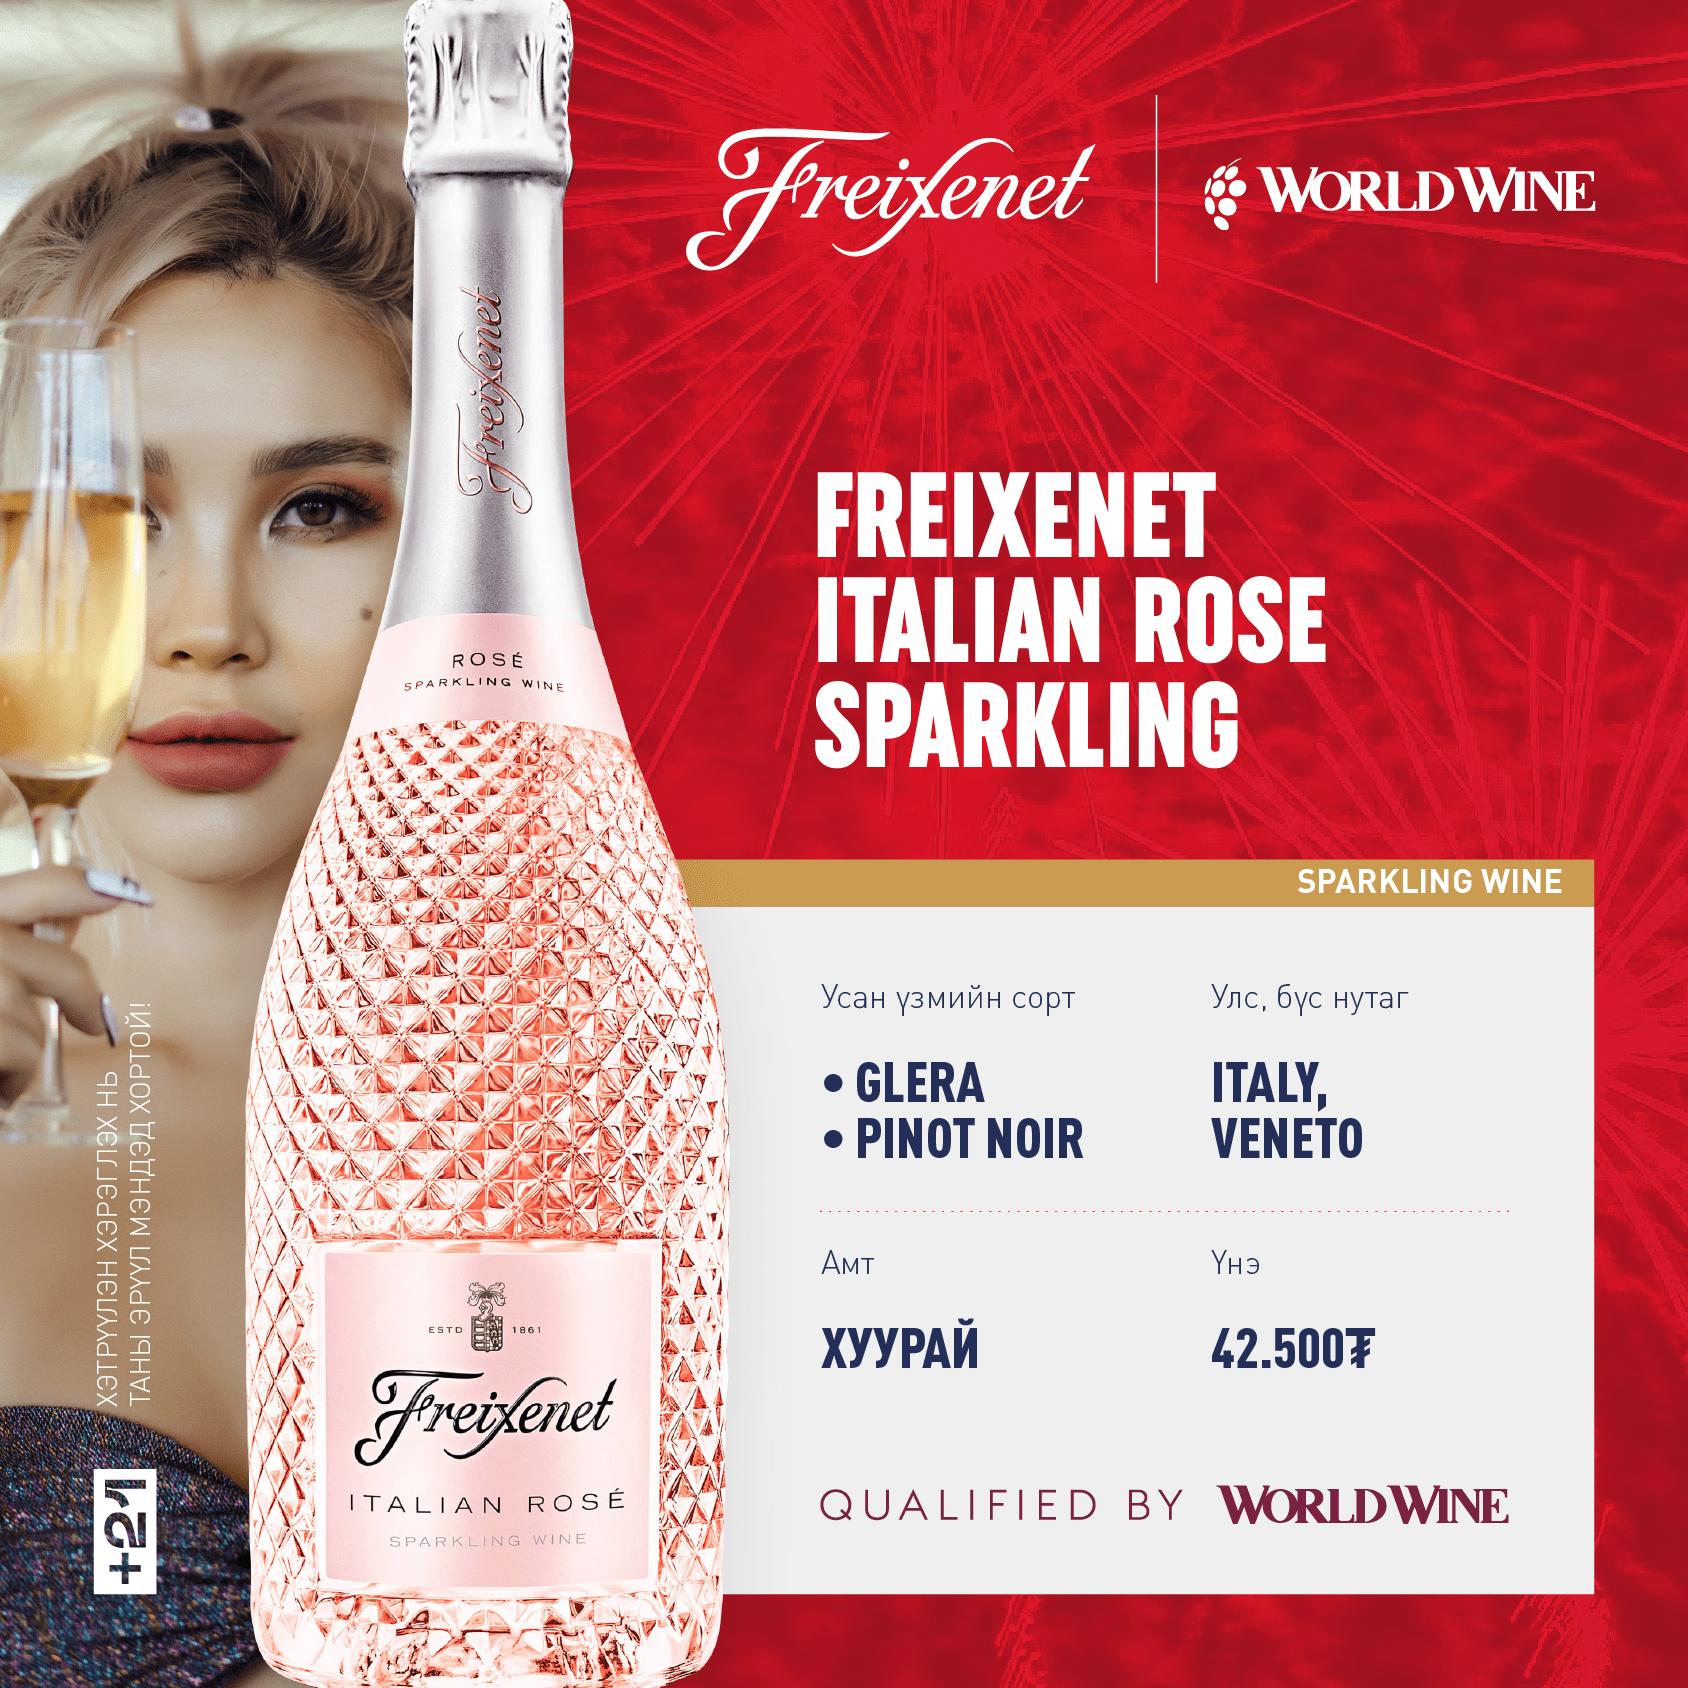 Freixenet italian rose sparkling